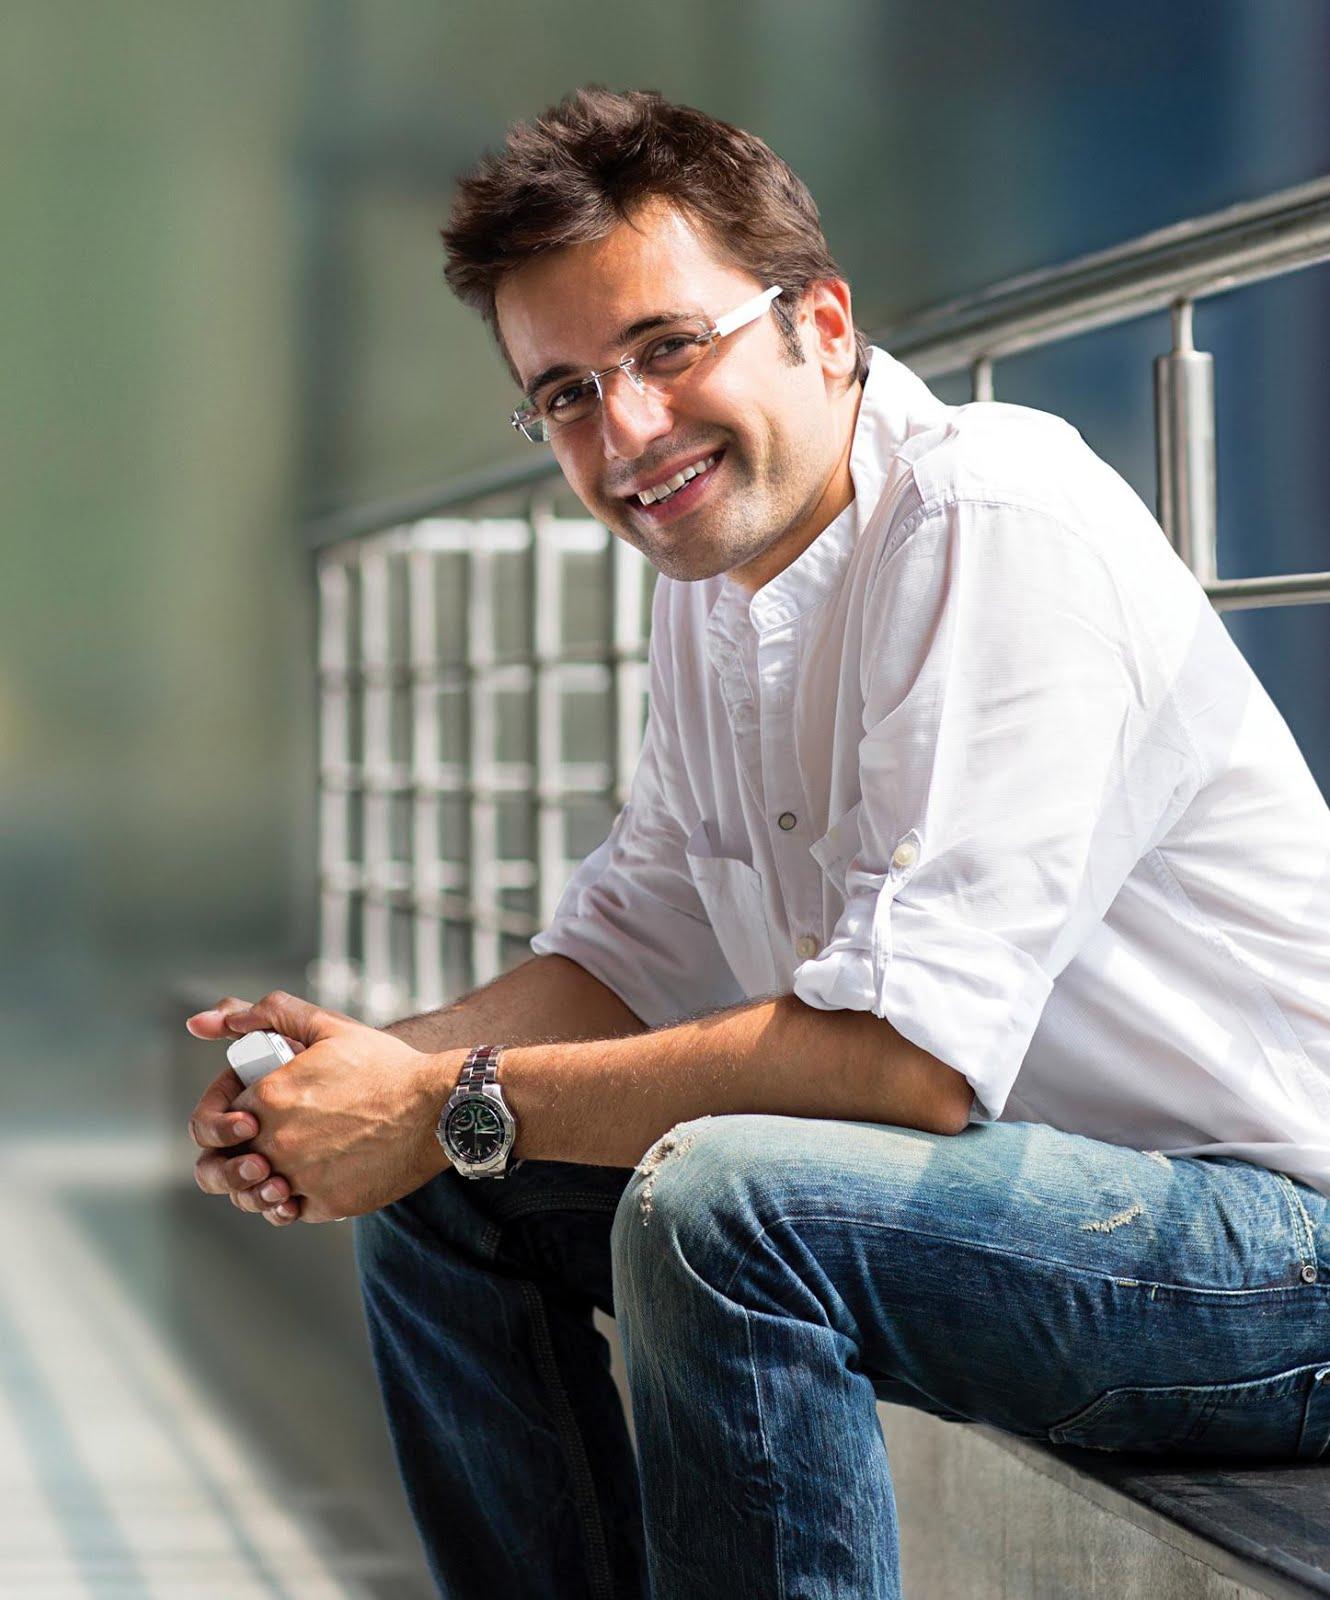 Top 10 Motivational Quotes By Sandeep Maheshwari On Quotss Com